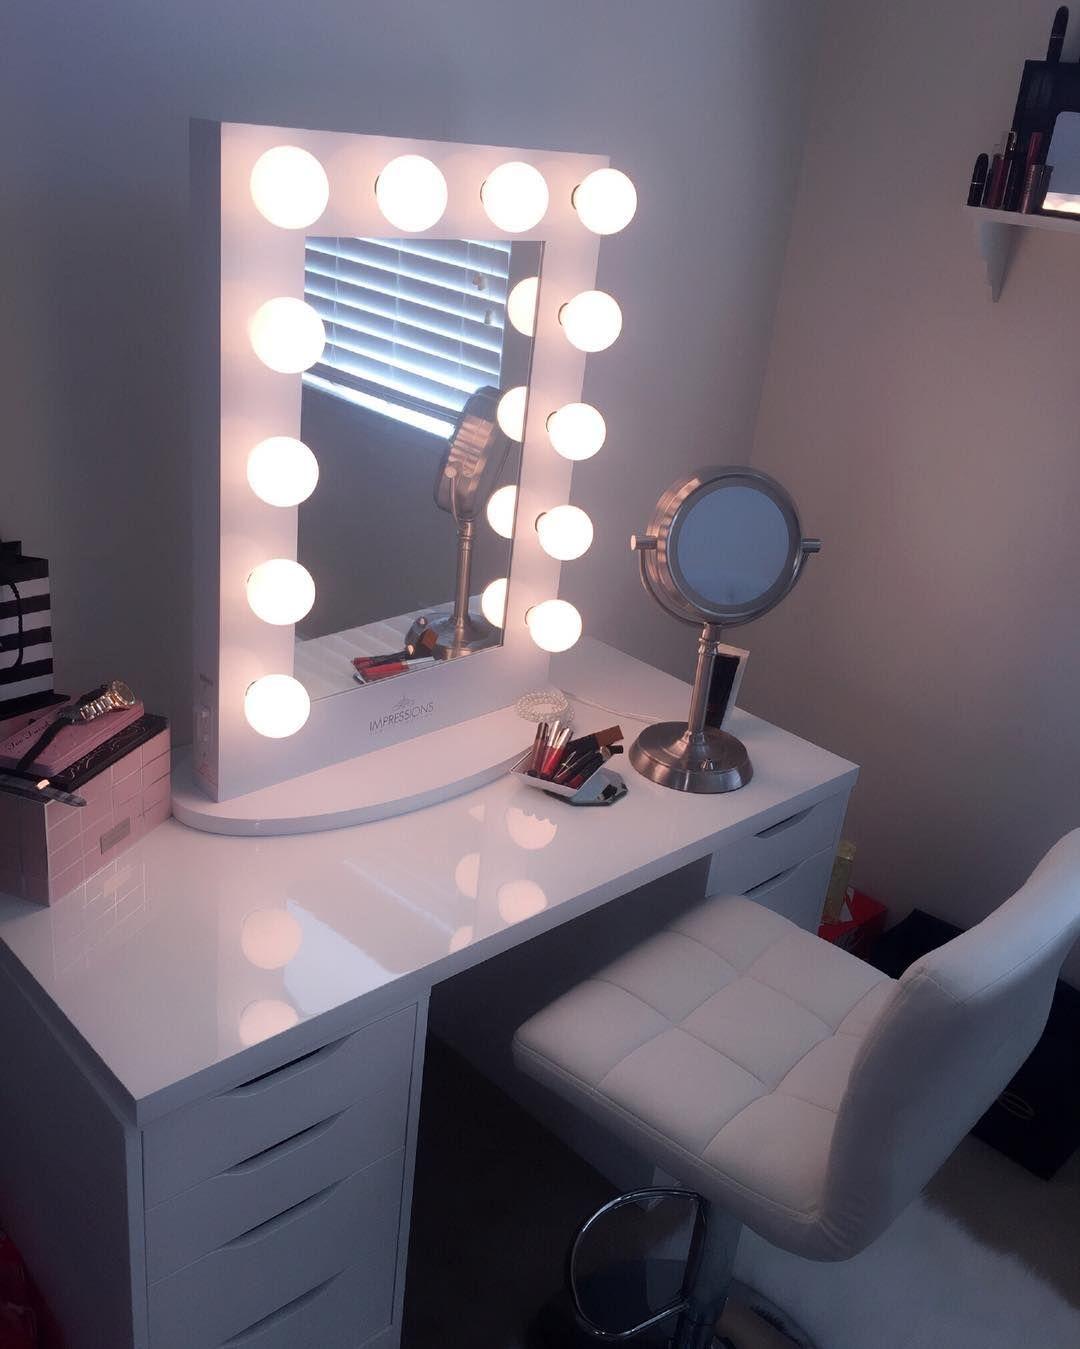 319f2fada Impressions Vanity Co. (@impressionsvanity) • Instagram photos and videos